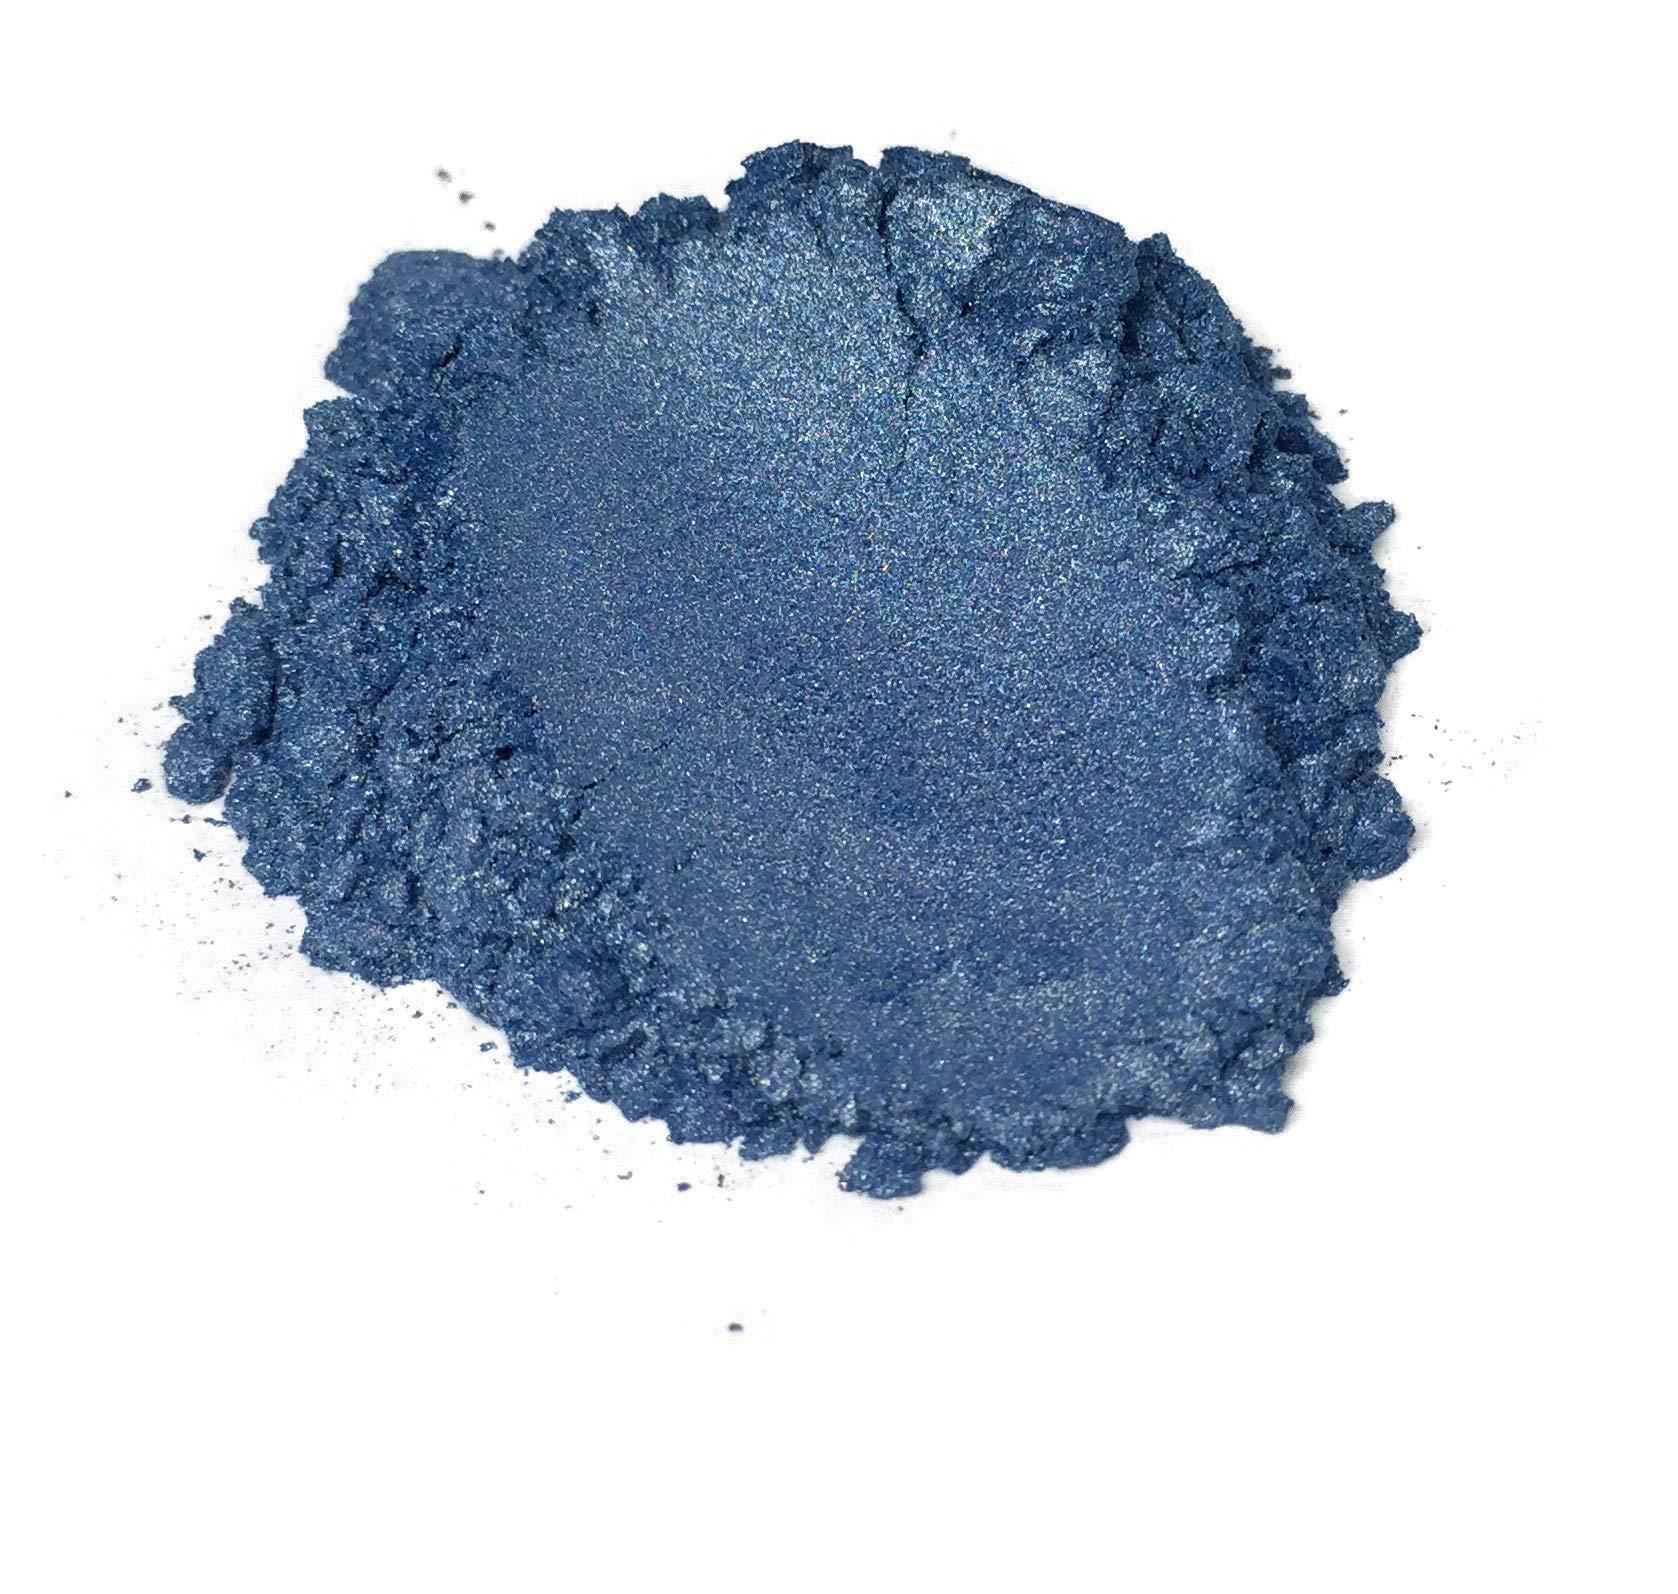 42g/1.5oz''GOLDEN INDIGO'' Mica Powder Pigment (Epoxy,Paint,Color,Art) Black Diamond Pigments